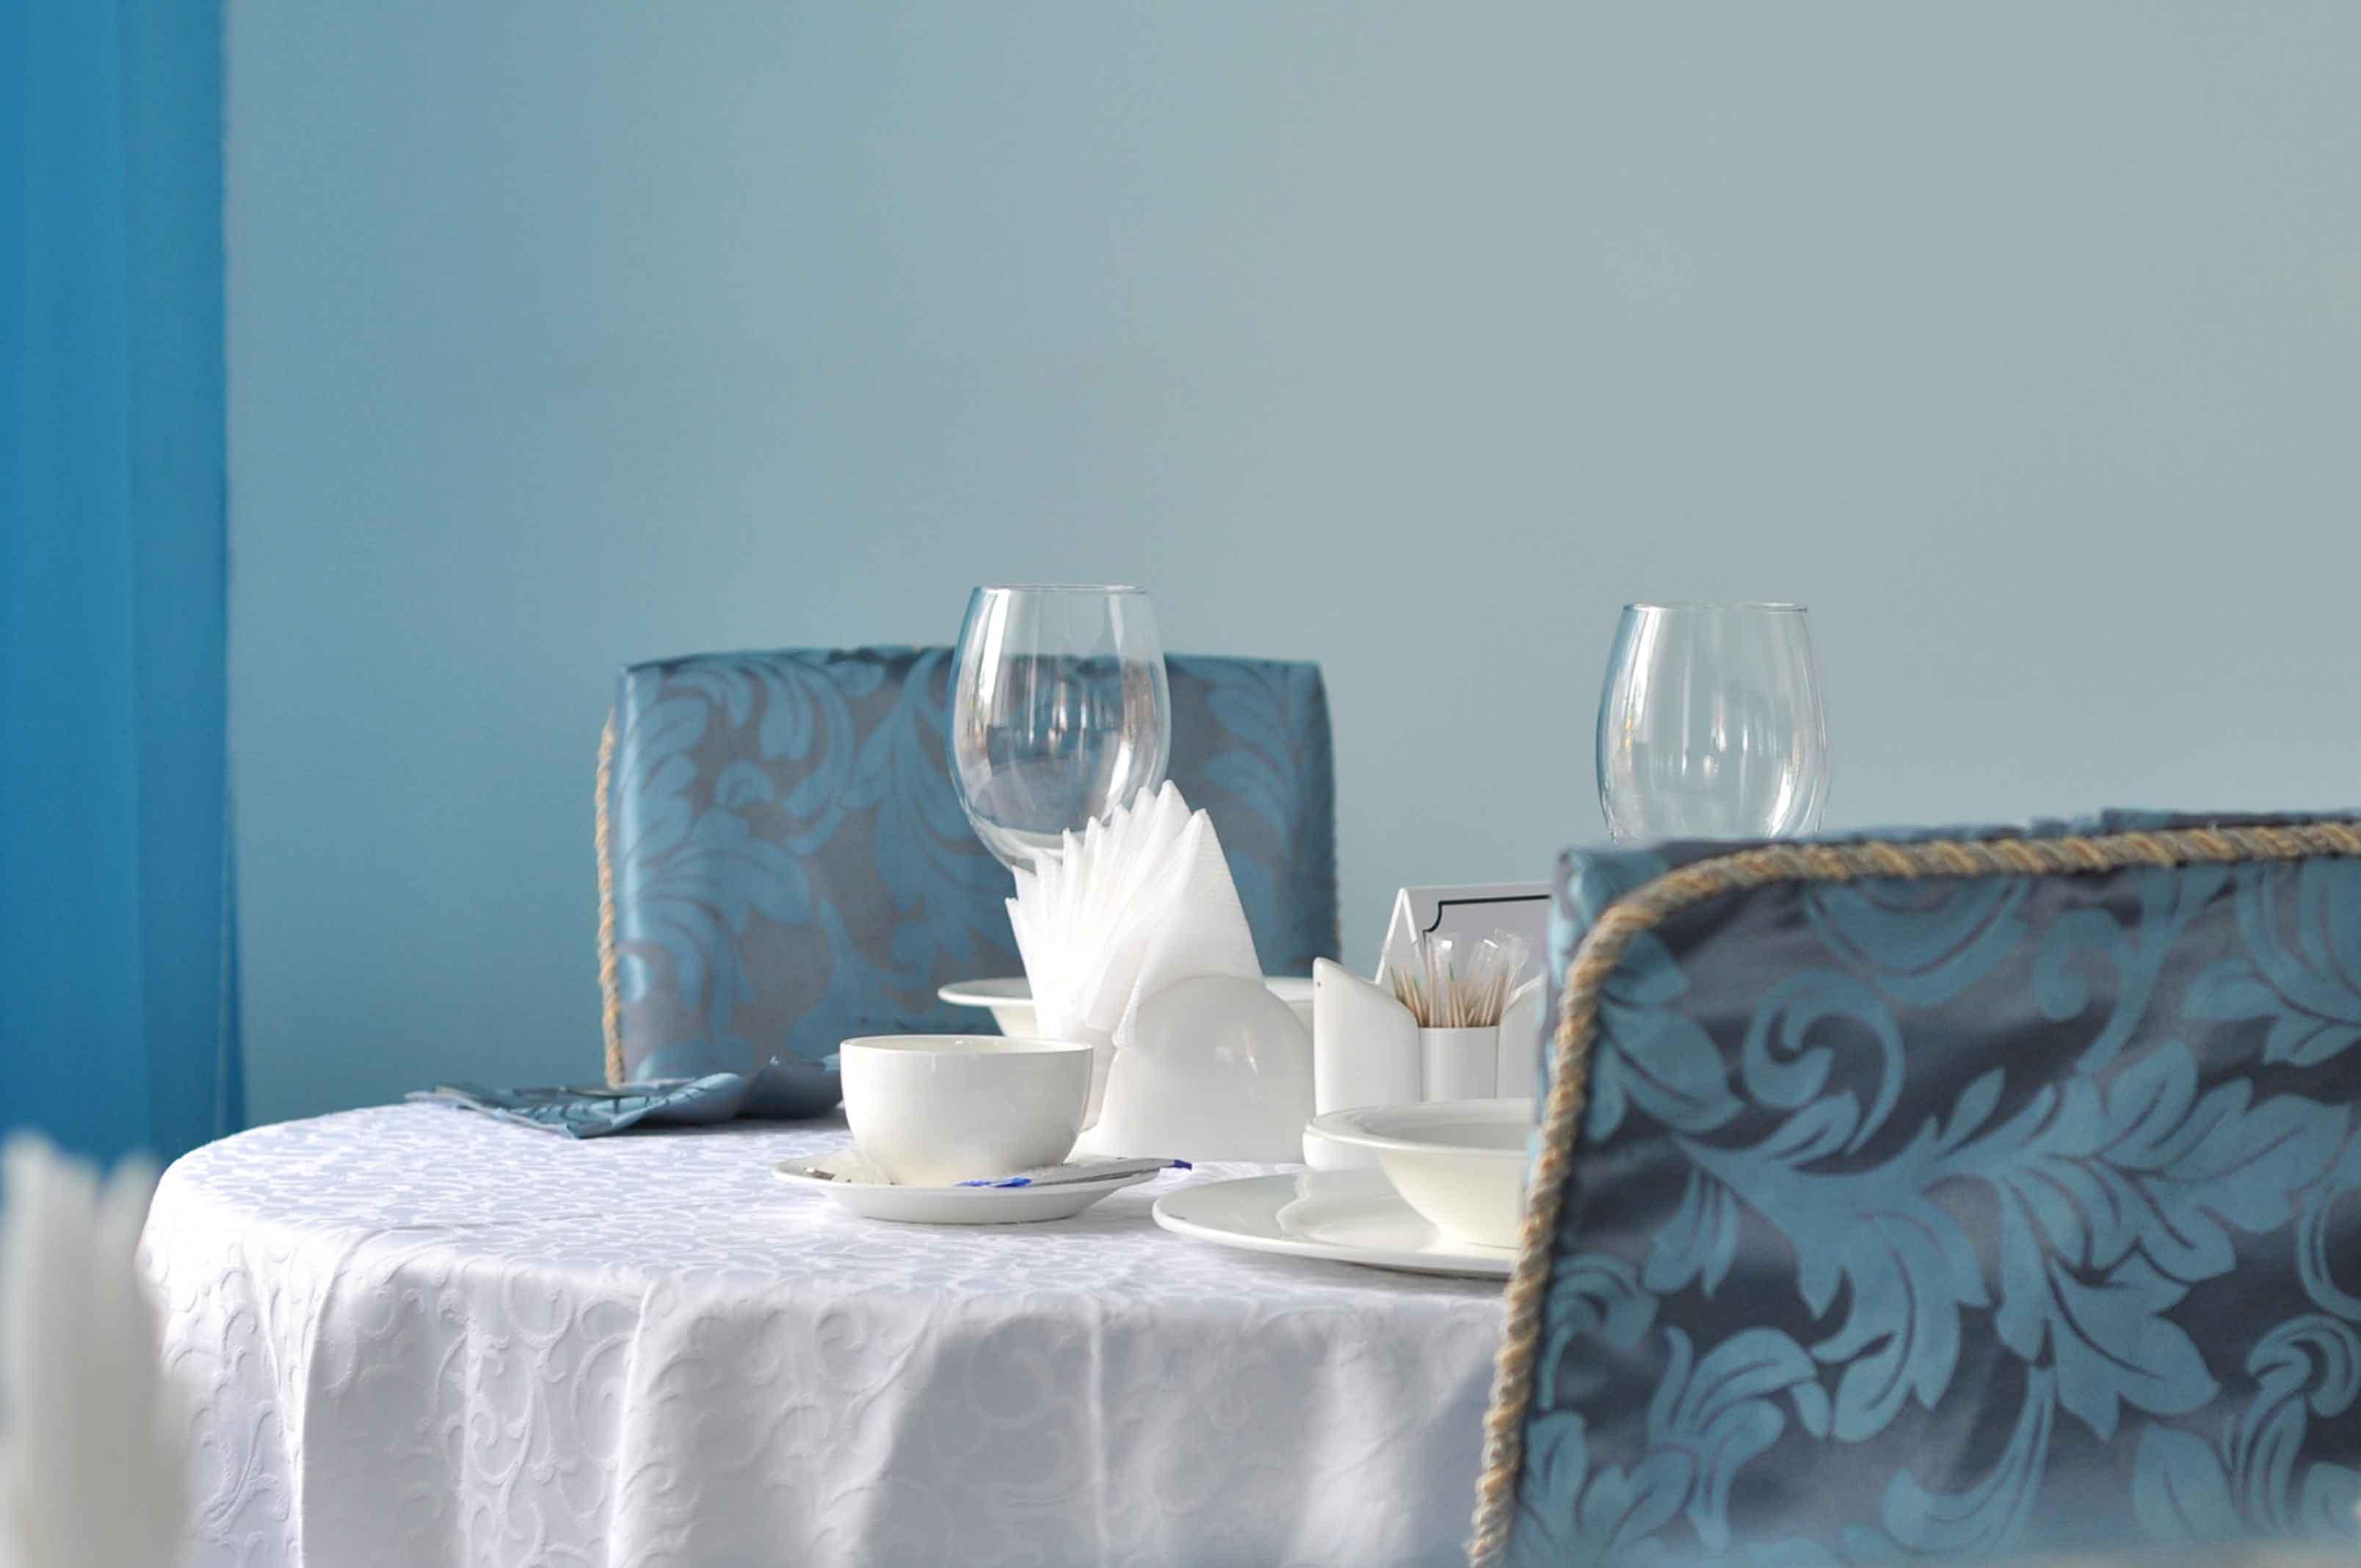 afina-hotel-restoran-berdjansk-3